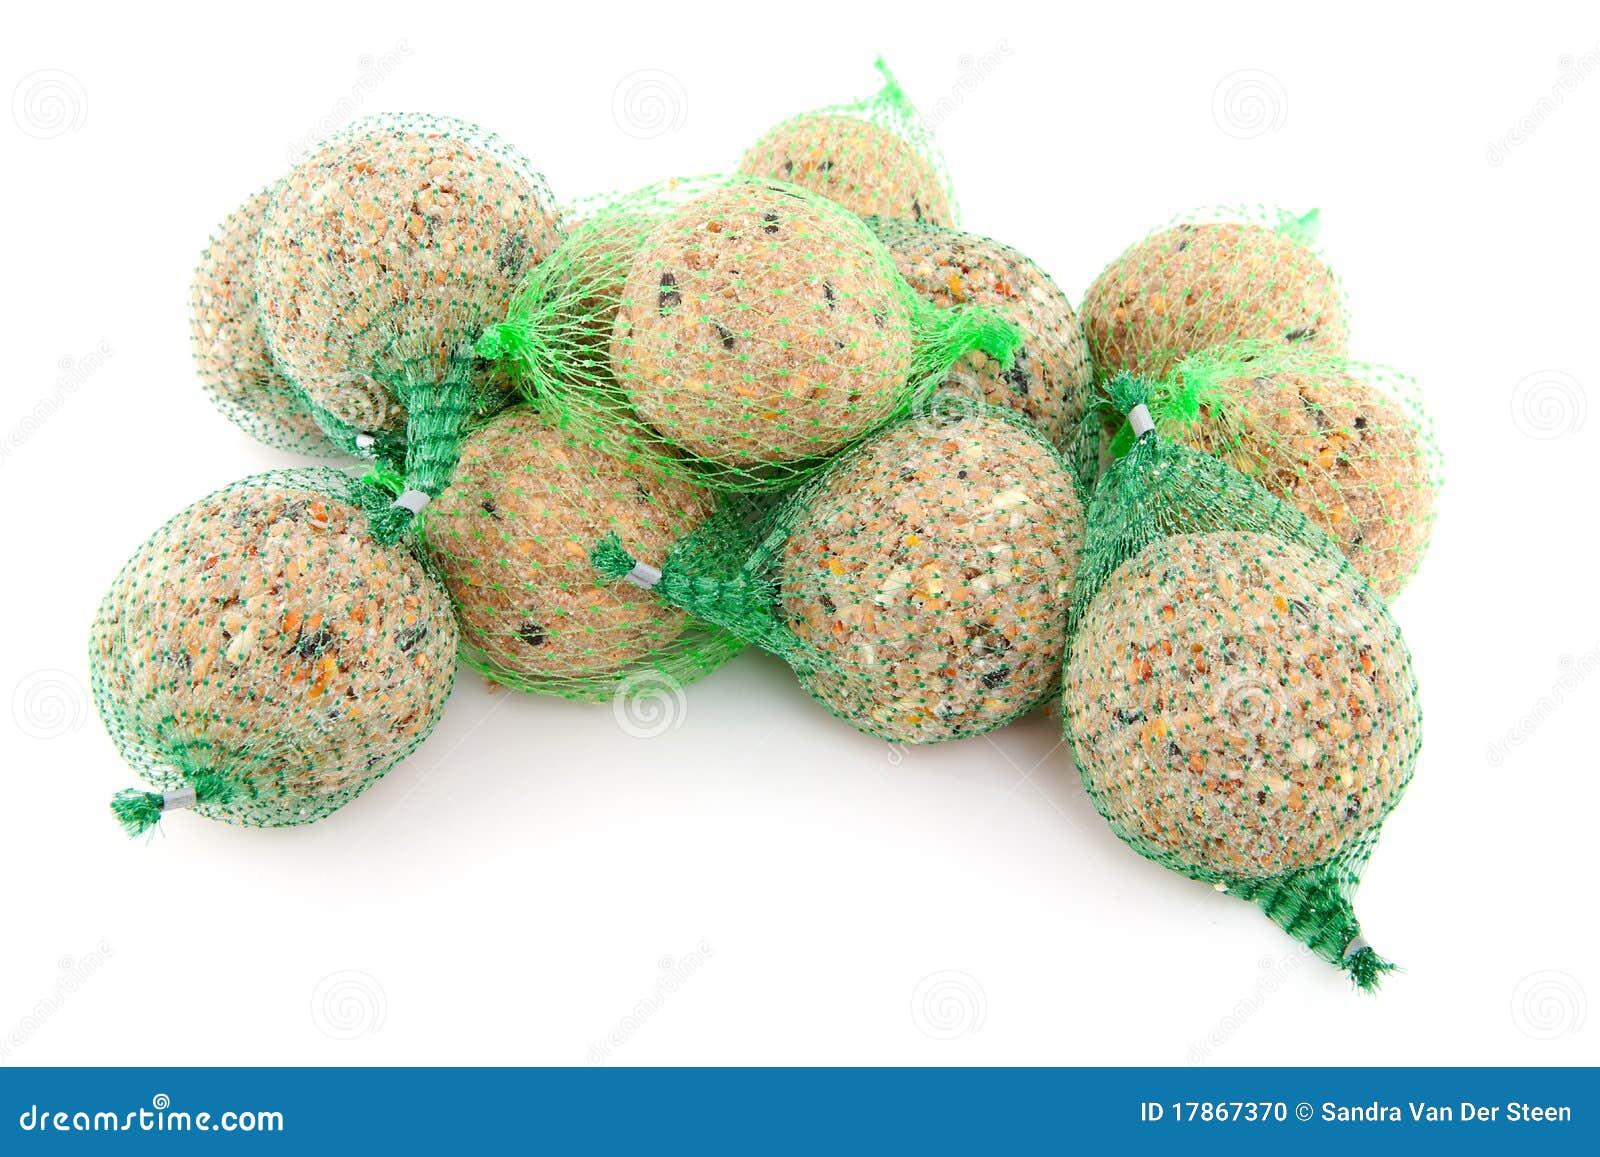 pile of fat balls for birds stock photo image 17867370. Black Bedroom Furniture Sets. Home Design Ideas